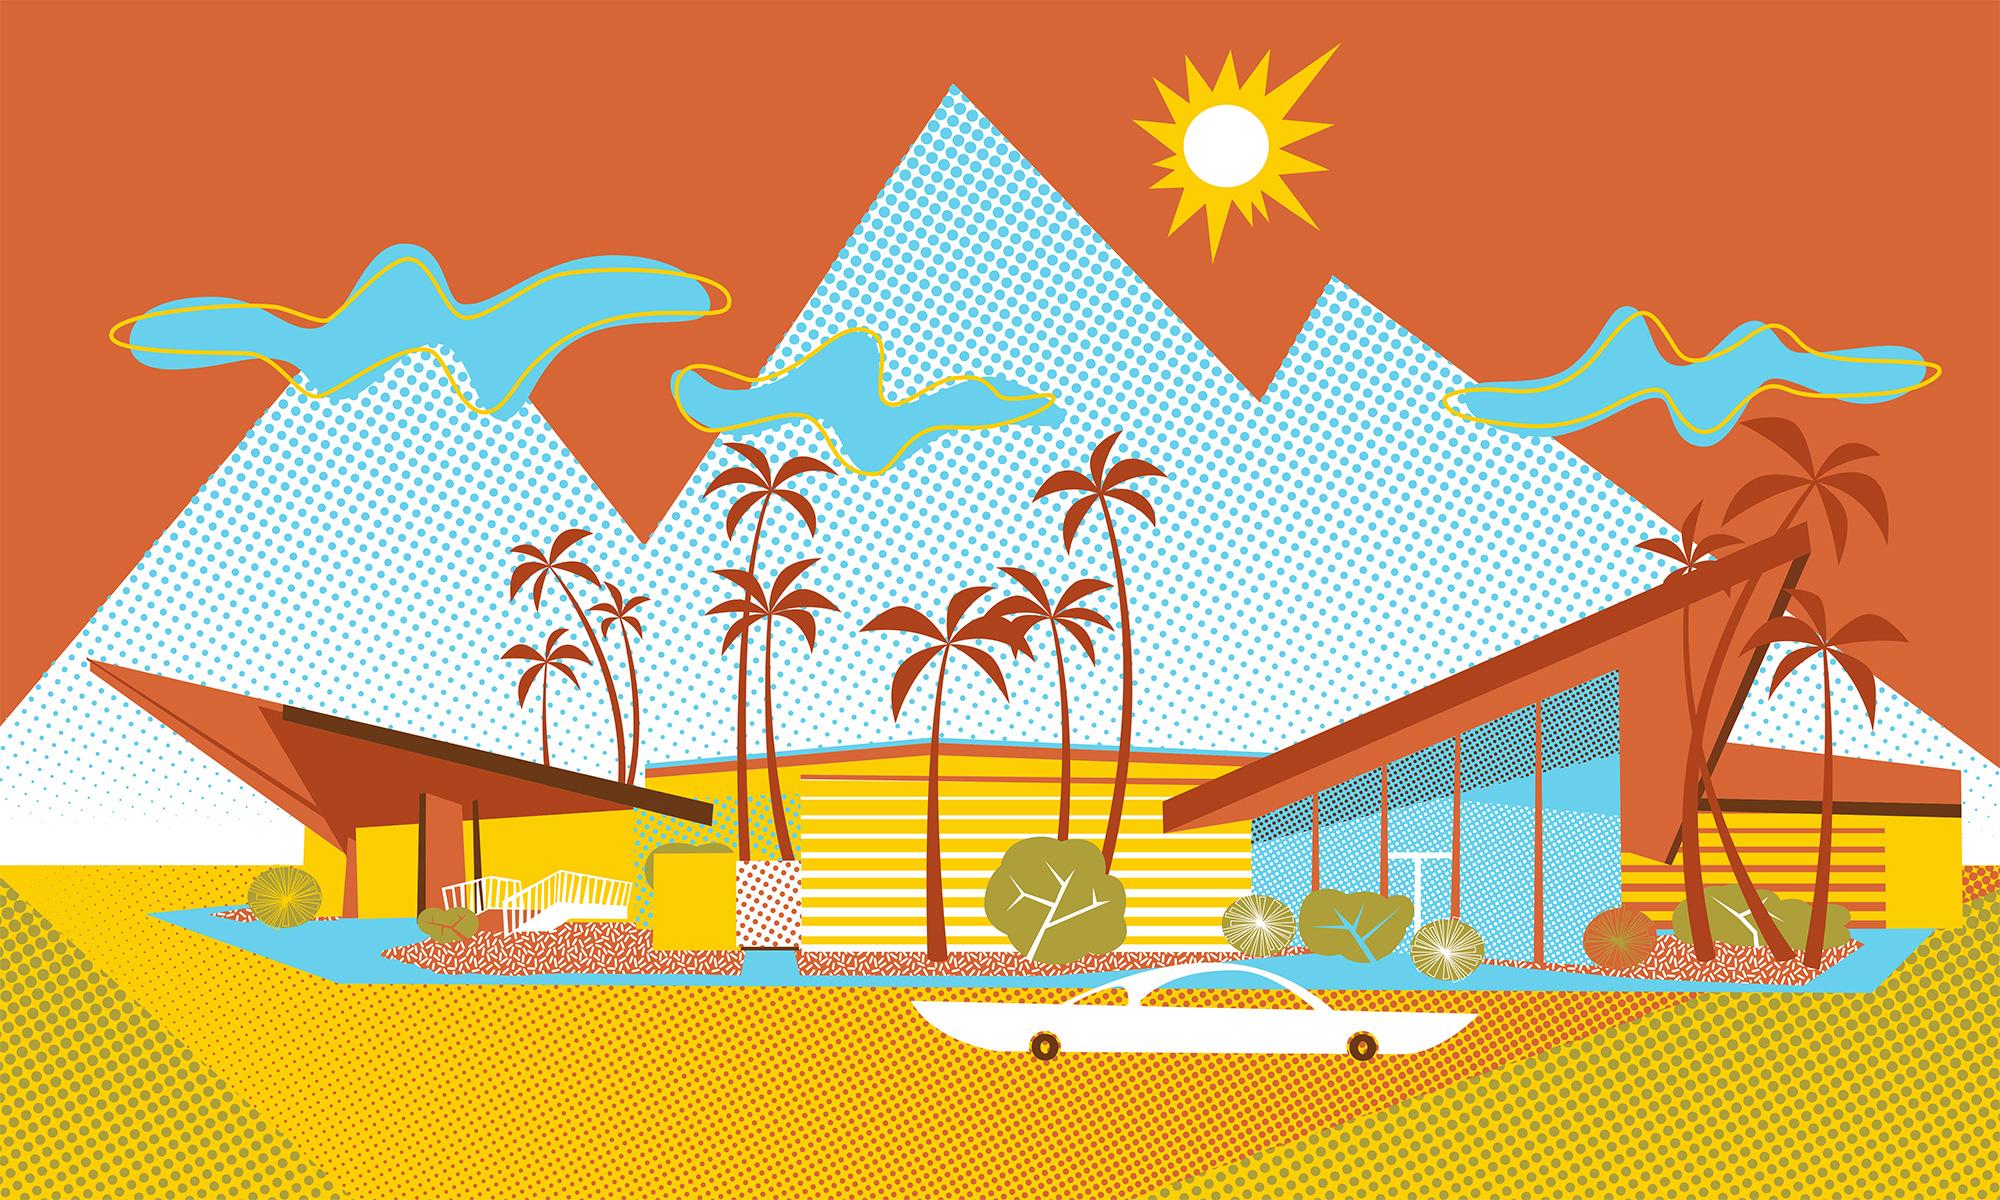 300 Bowl Googie-style building in Phoenix, AZ